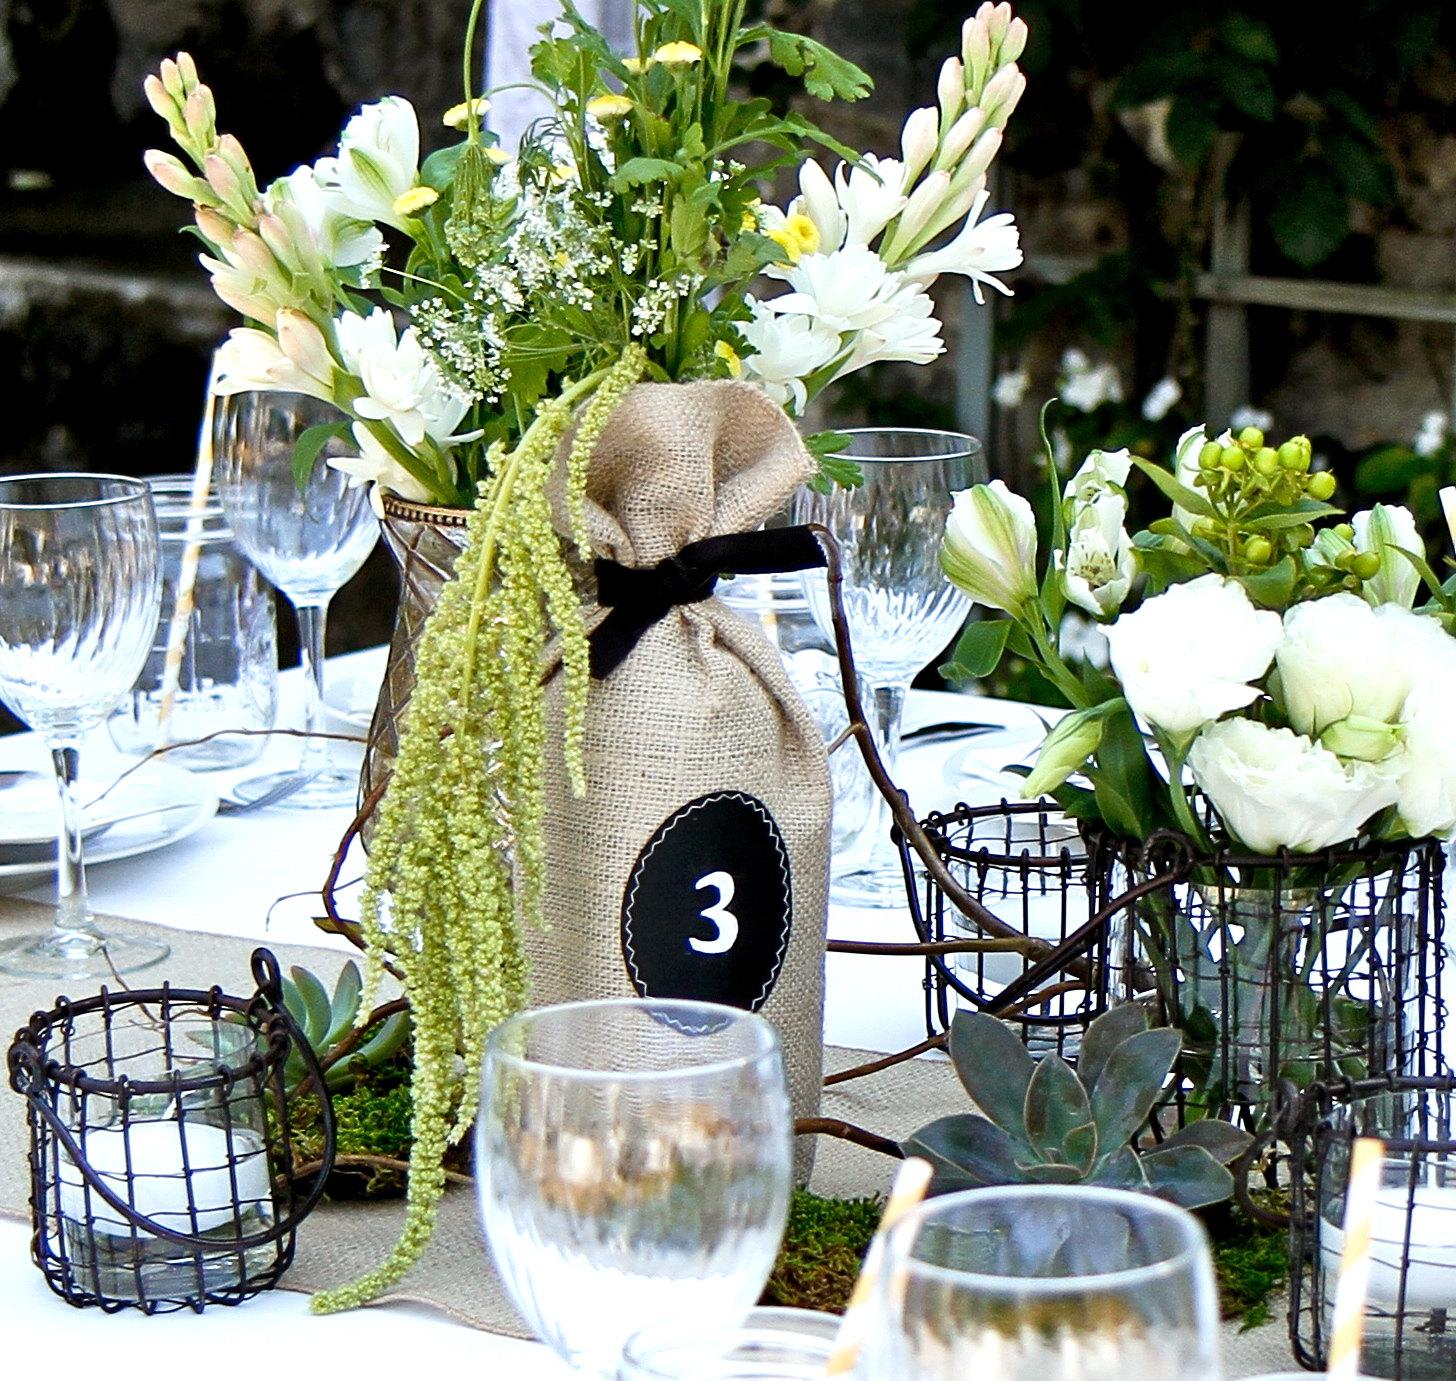 Rustic Wedding Ideas Using Burlap: 15 Ways To Use Burlap For Rustic Weddings